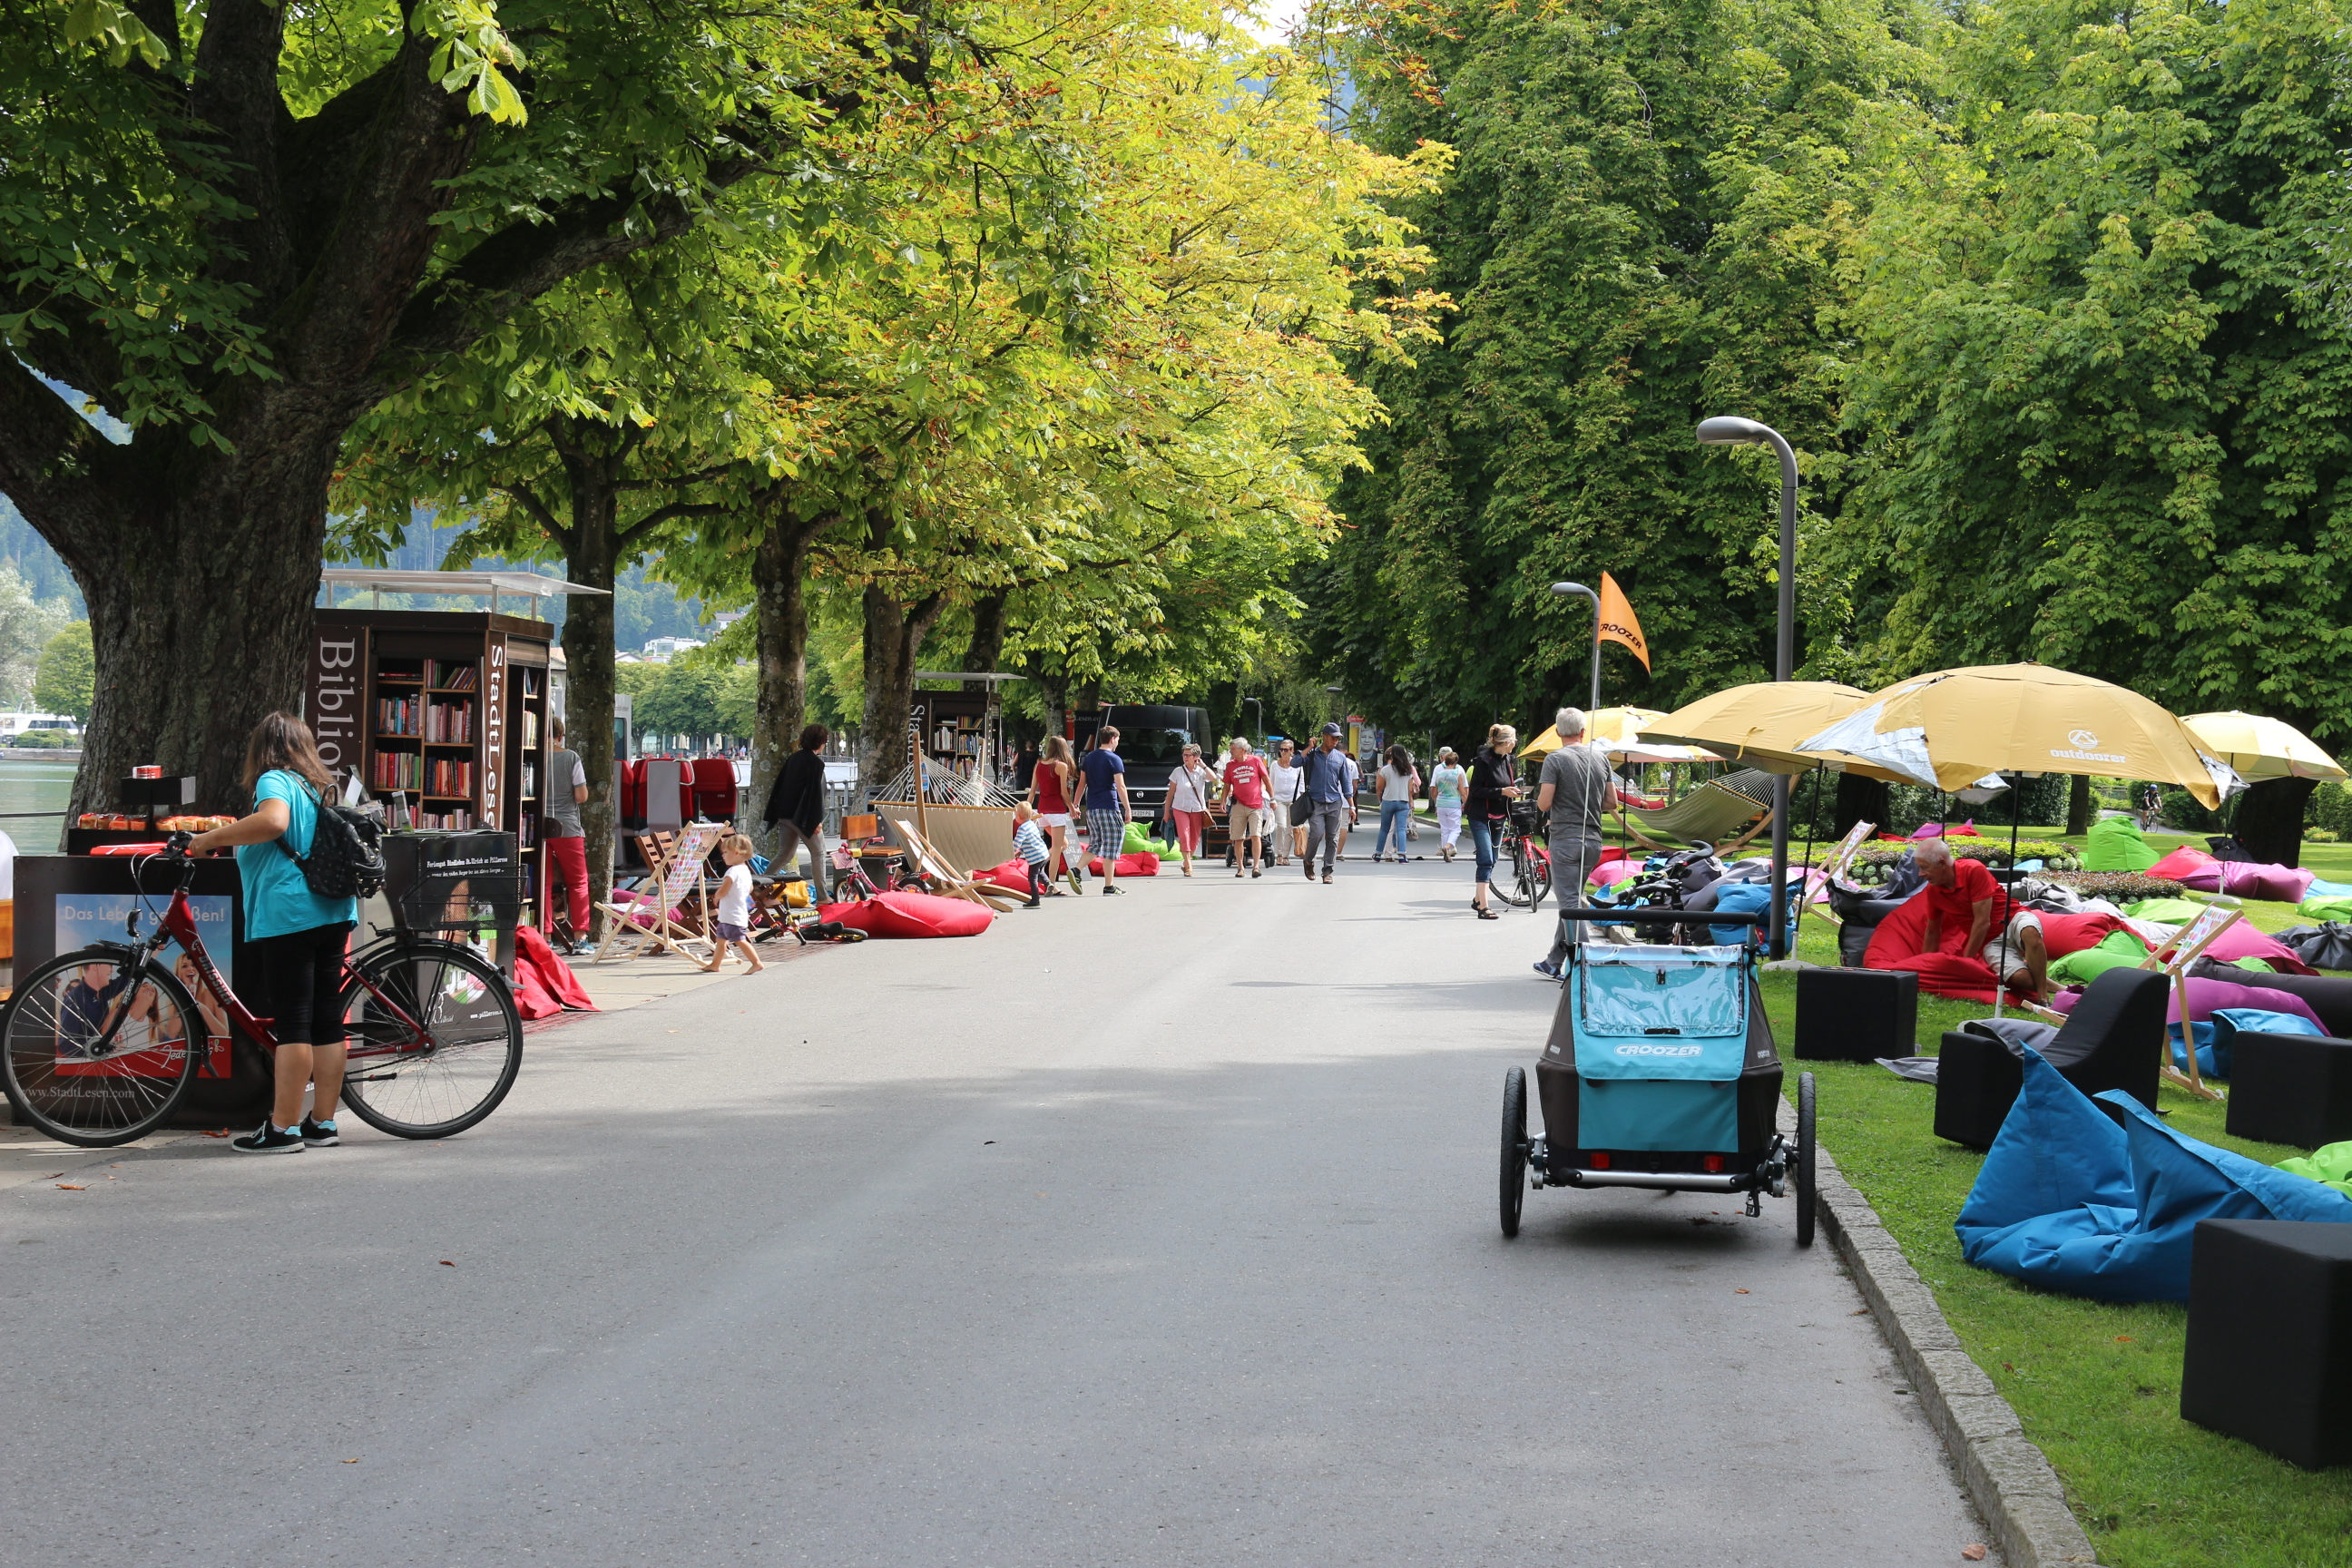 Seepromenade Bregenz mit Outdoorer Sonnenschirmen Sombrello